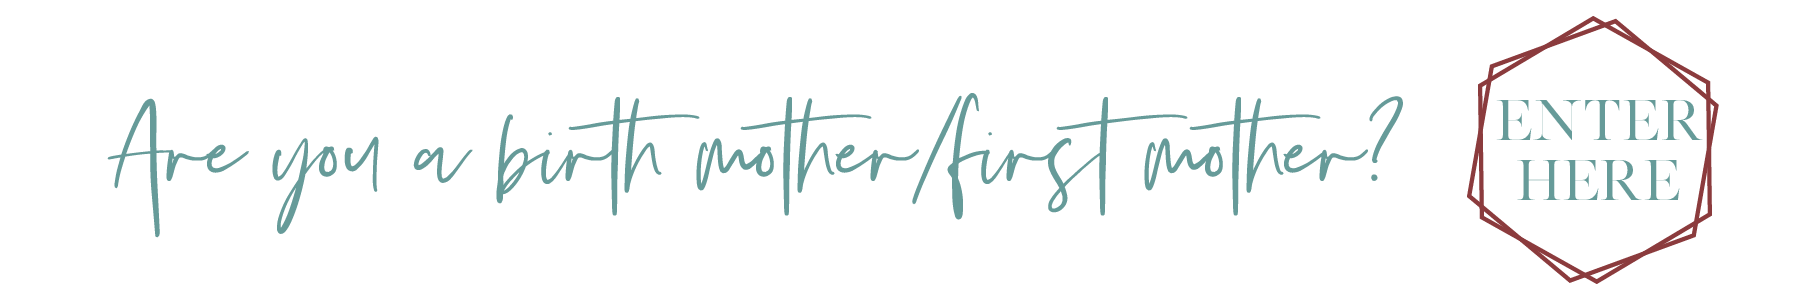 K2Kbirthmotherenterhere-01[16868].png